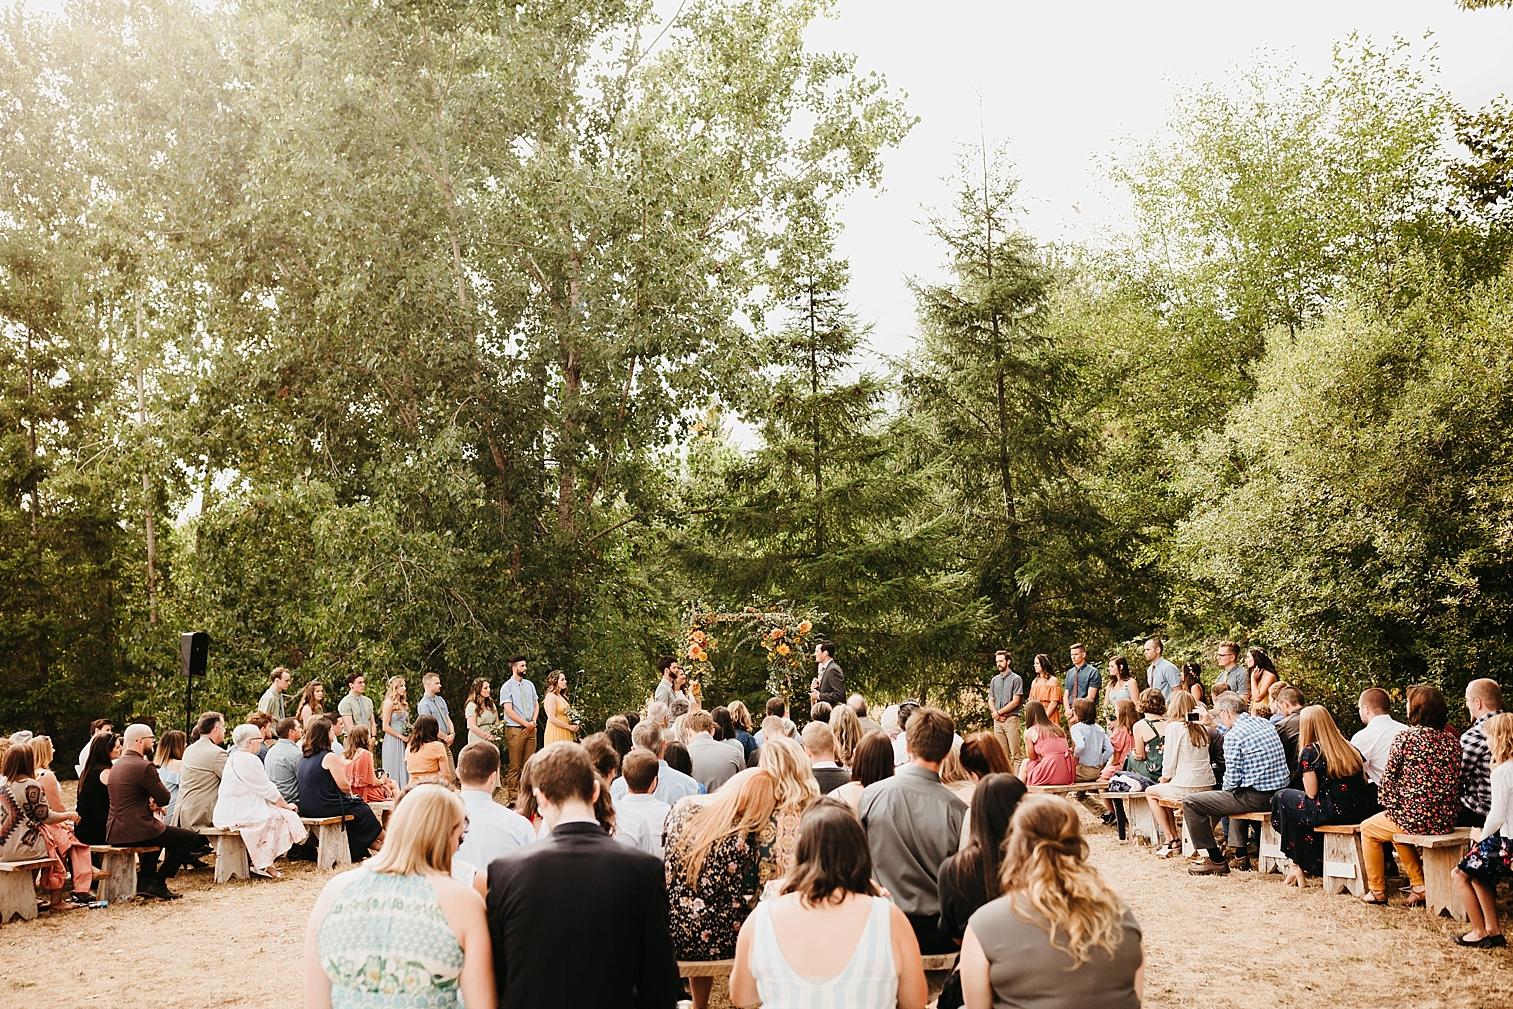 Summer-Camp-Themed-Wedding-88.jpg